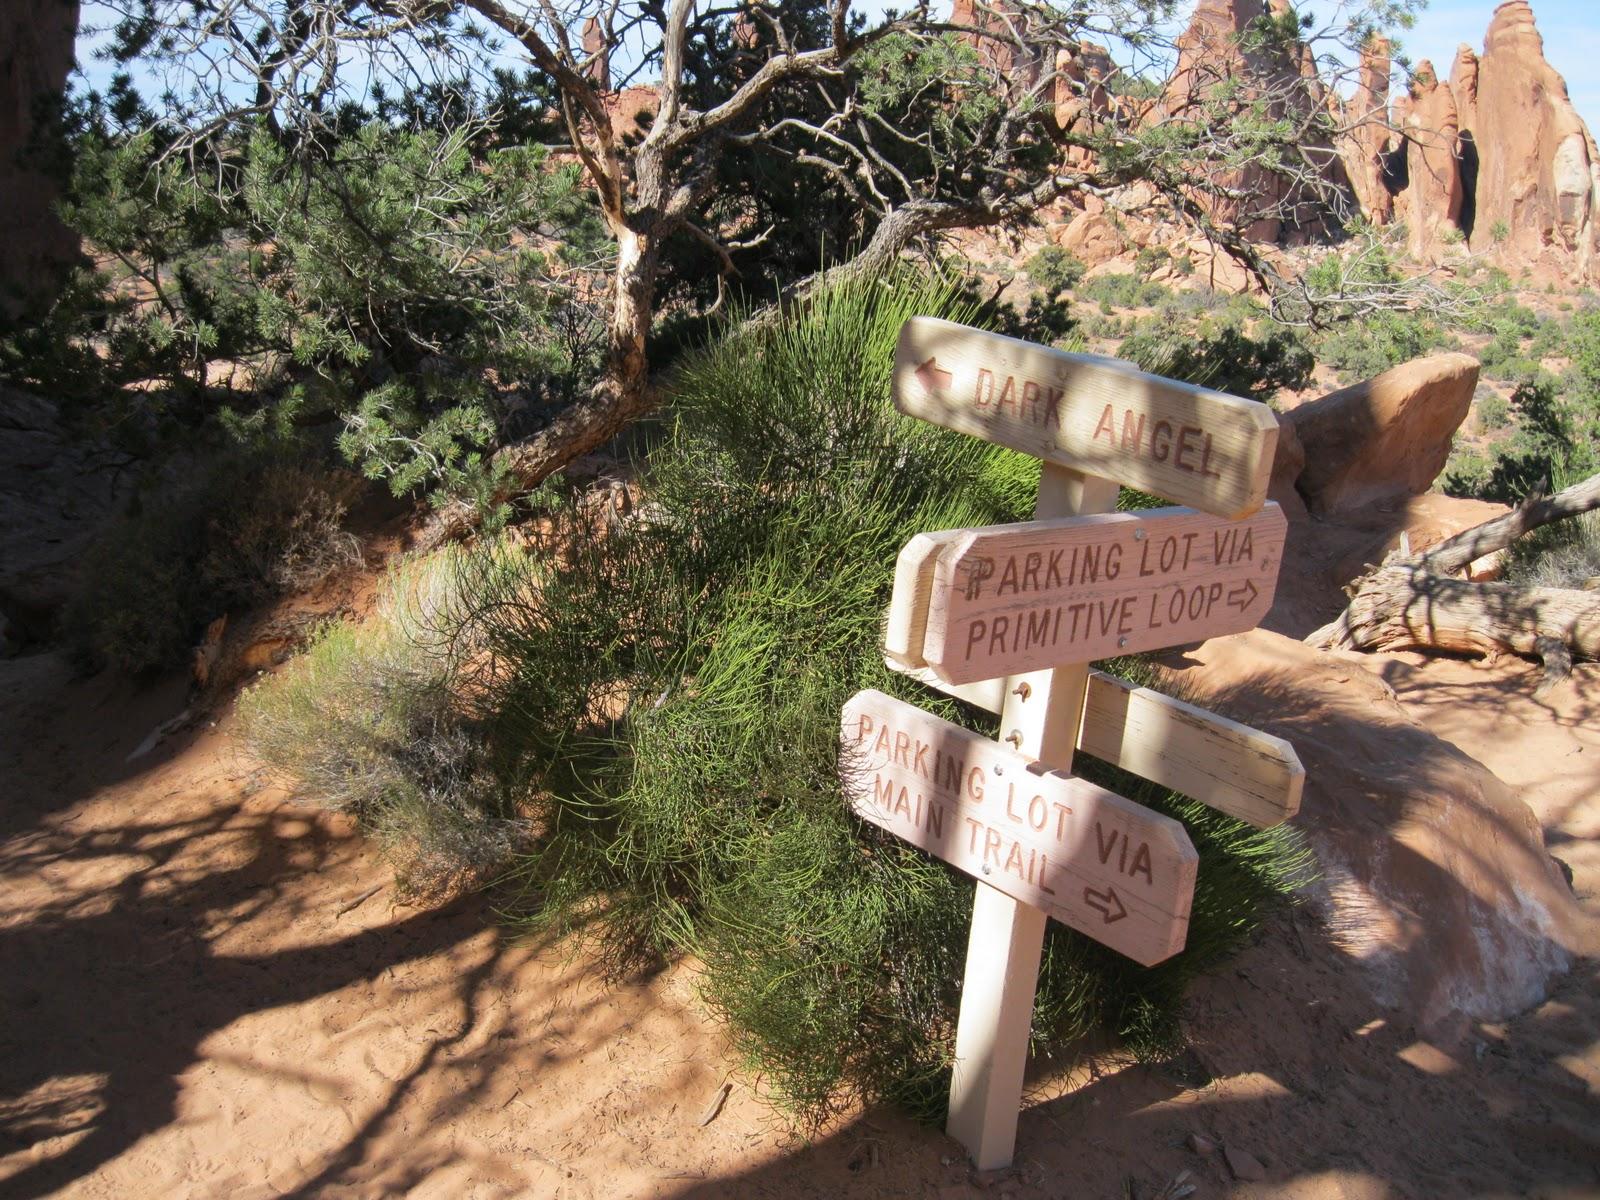 Four Corners Hikes-Arches National Park: Dark Angel Trail-Devils Garden